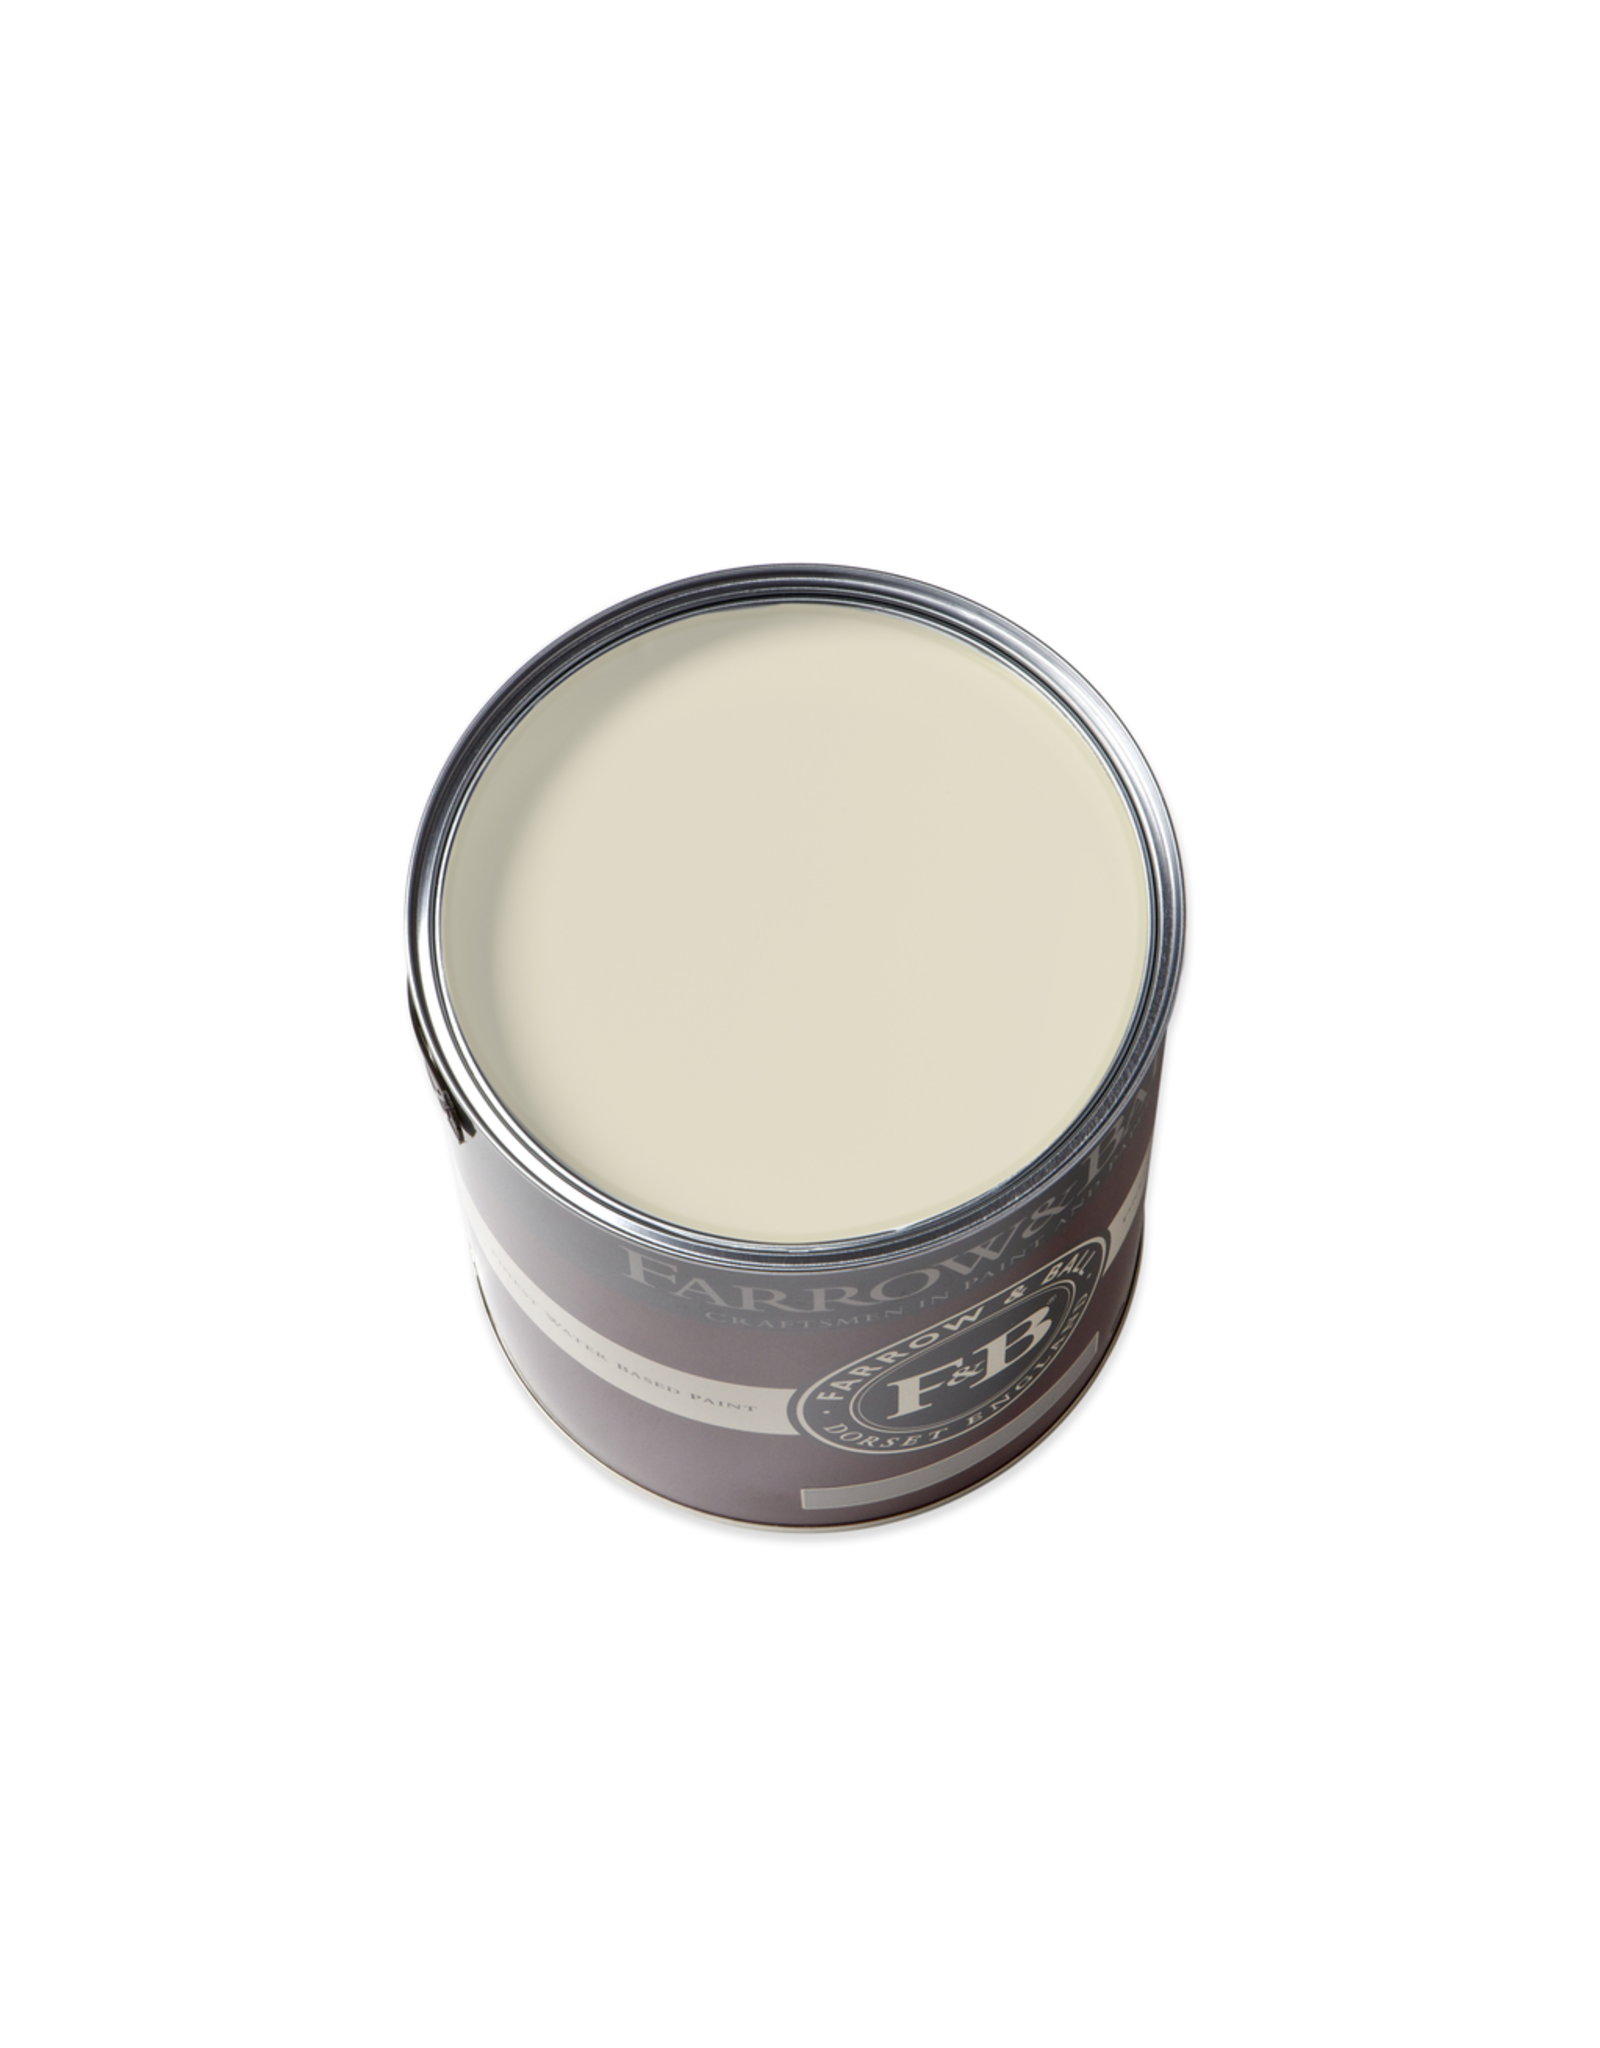 Farrow and Ball Gallon Modern Emulsion Lime White No. 1